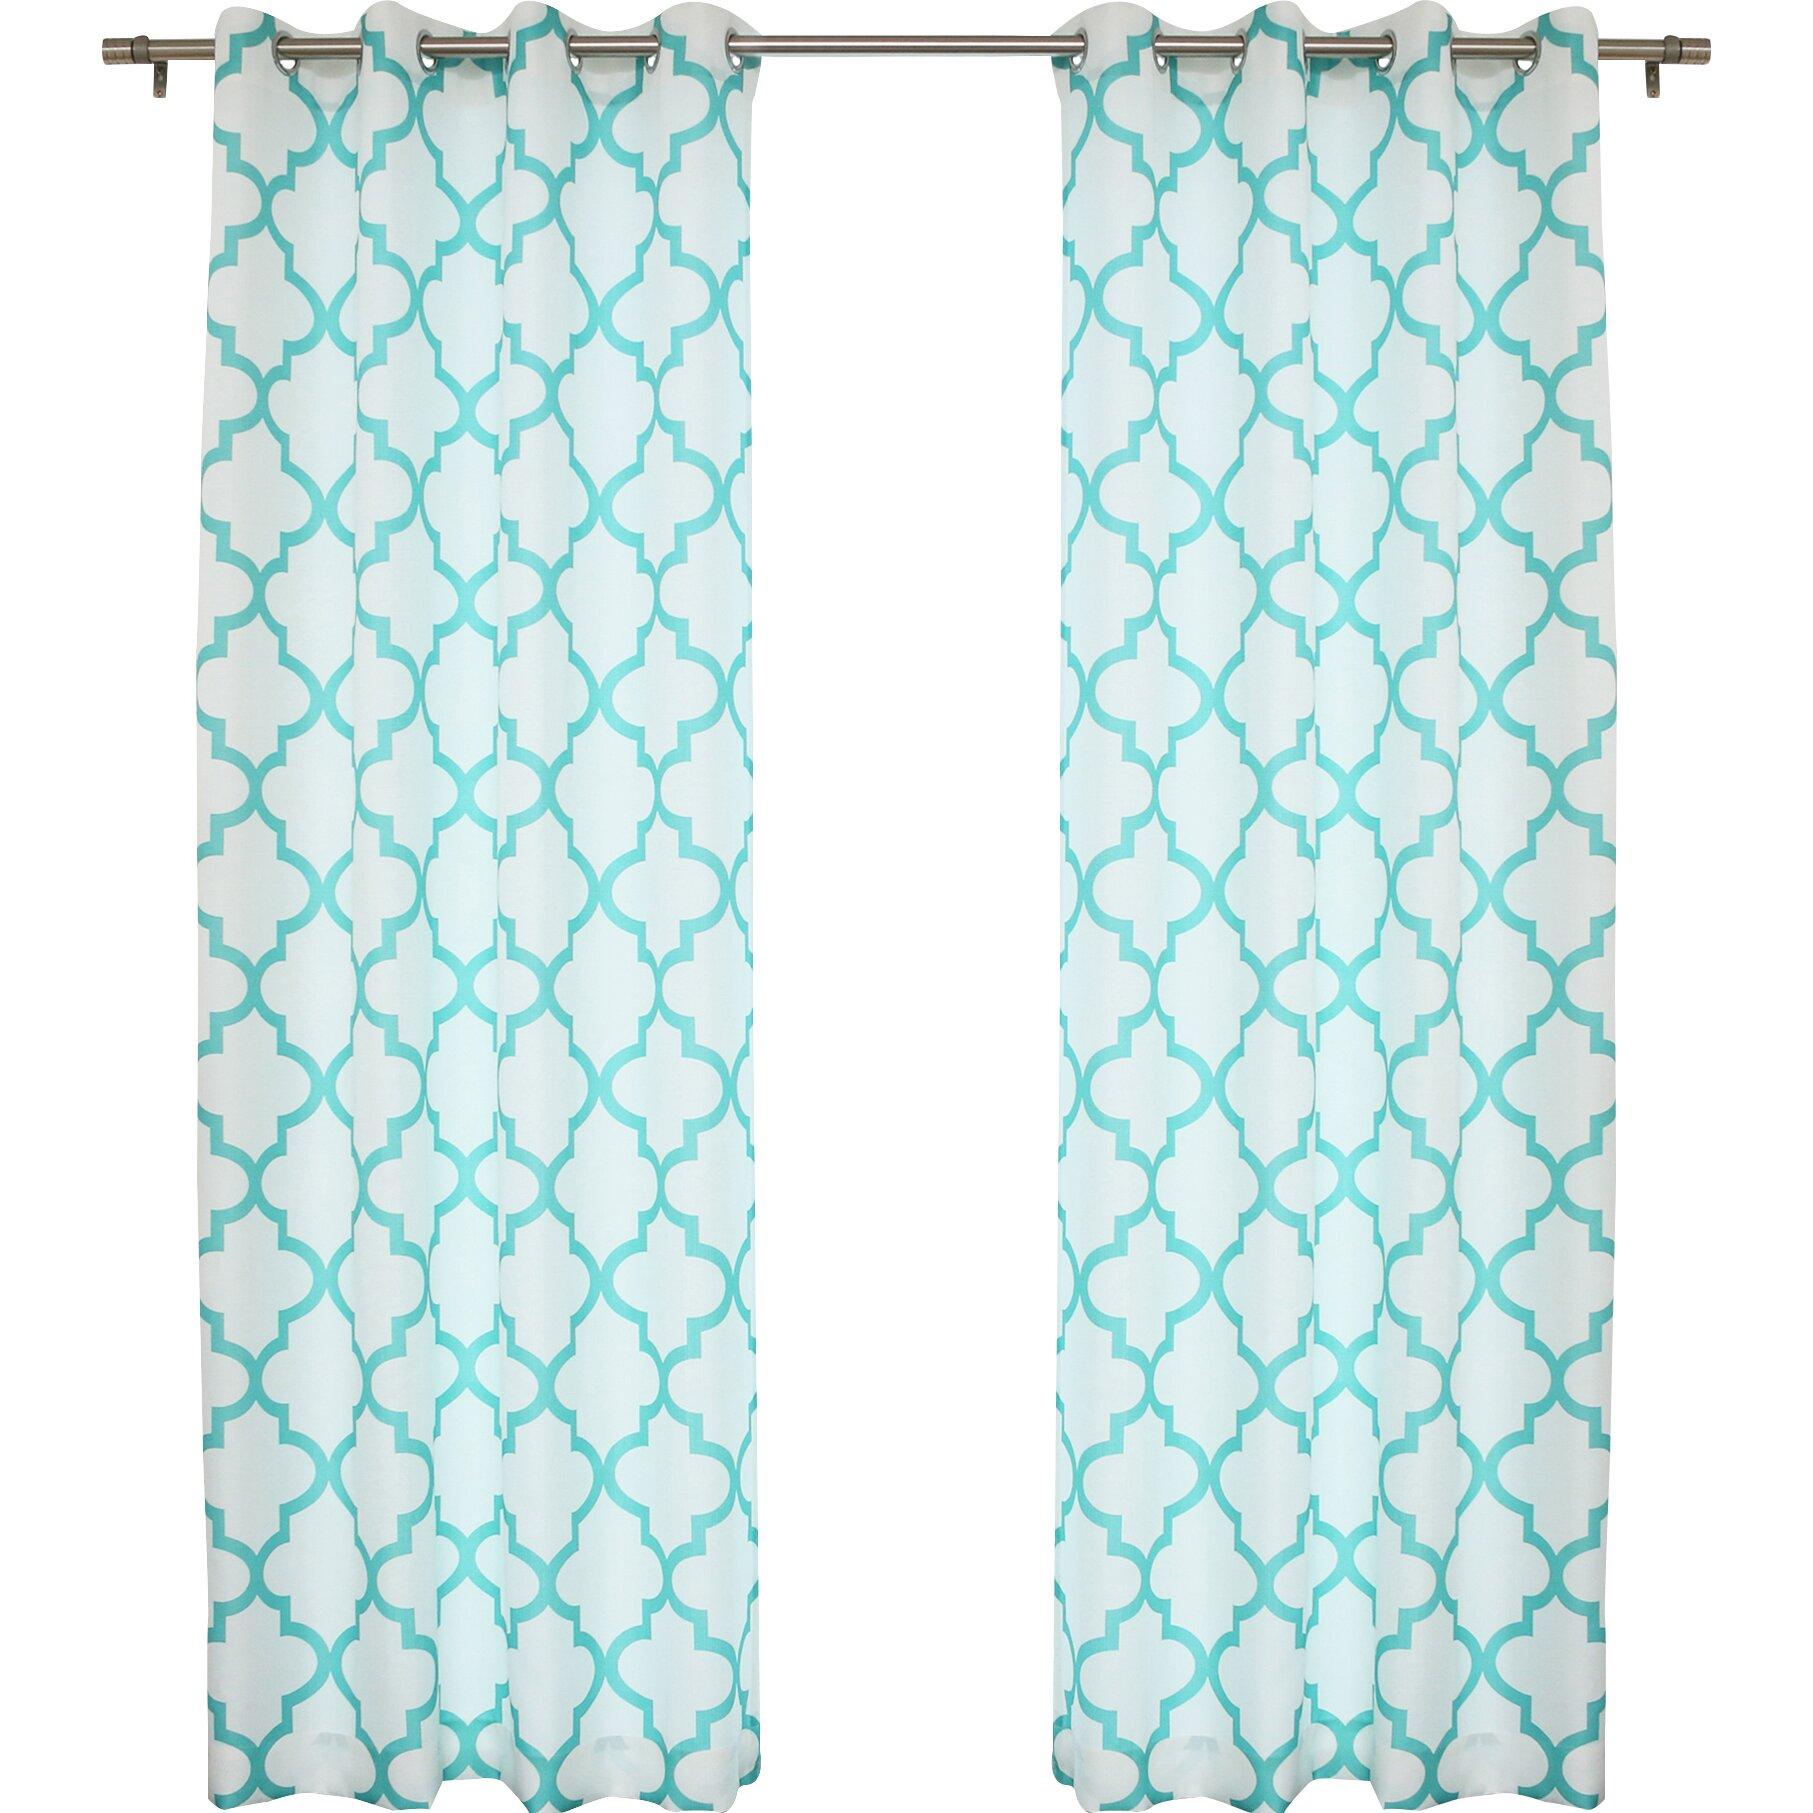 Best Home Fashion Inc Oxford Basketweave Curtain Panel